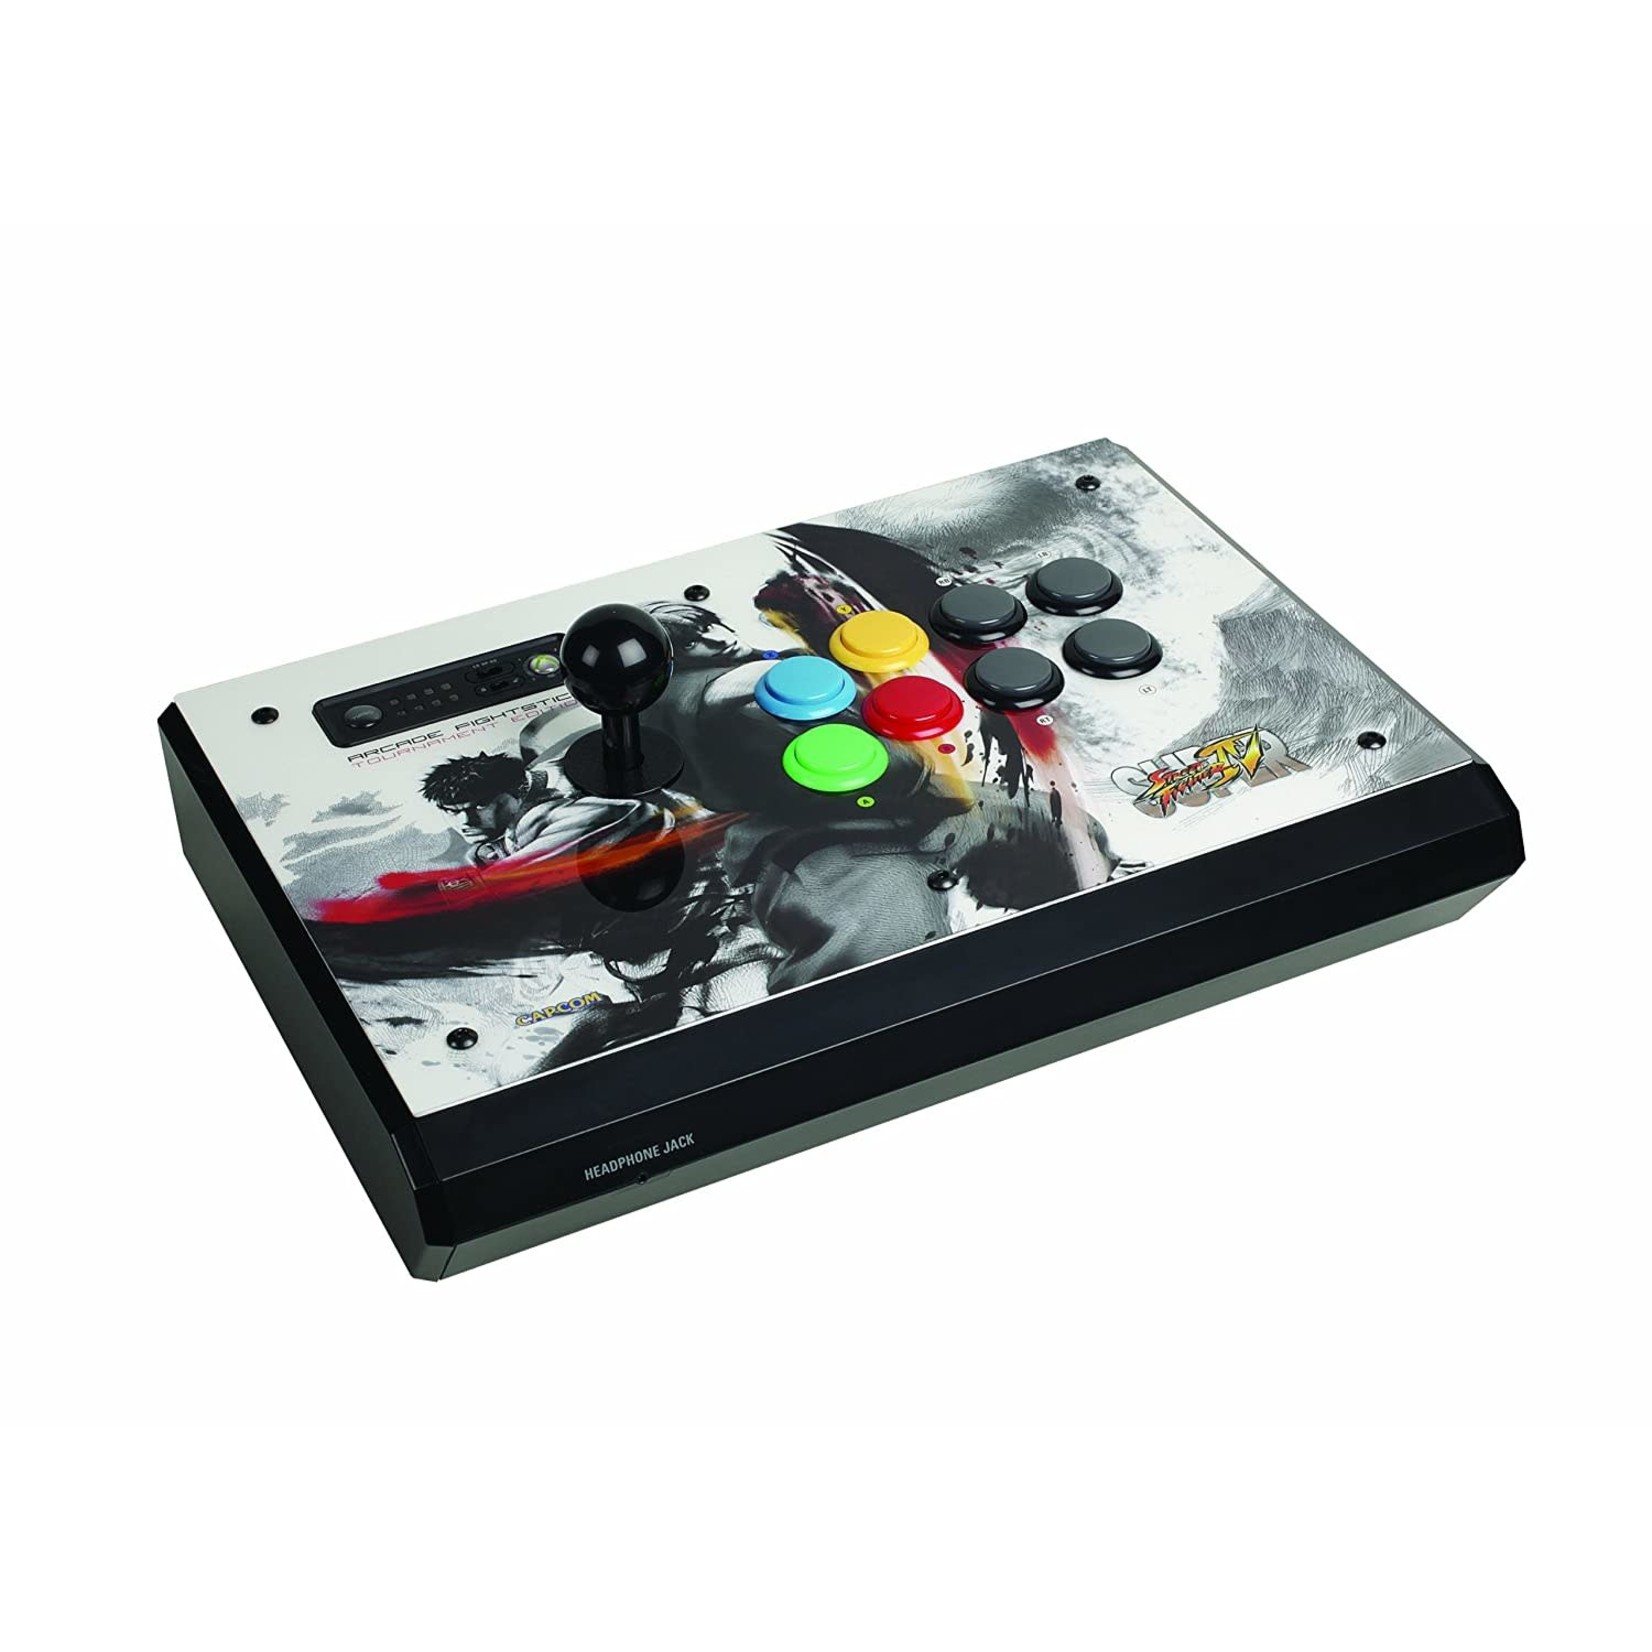 Mad Catz Super Street Fighter IV Arcade Fightstick Tournament Edition S Xbox 360 IN BOX